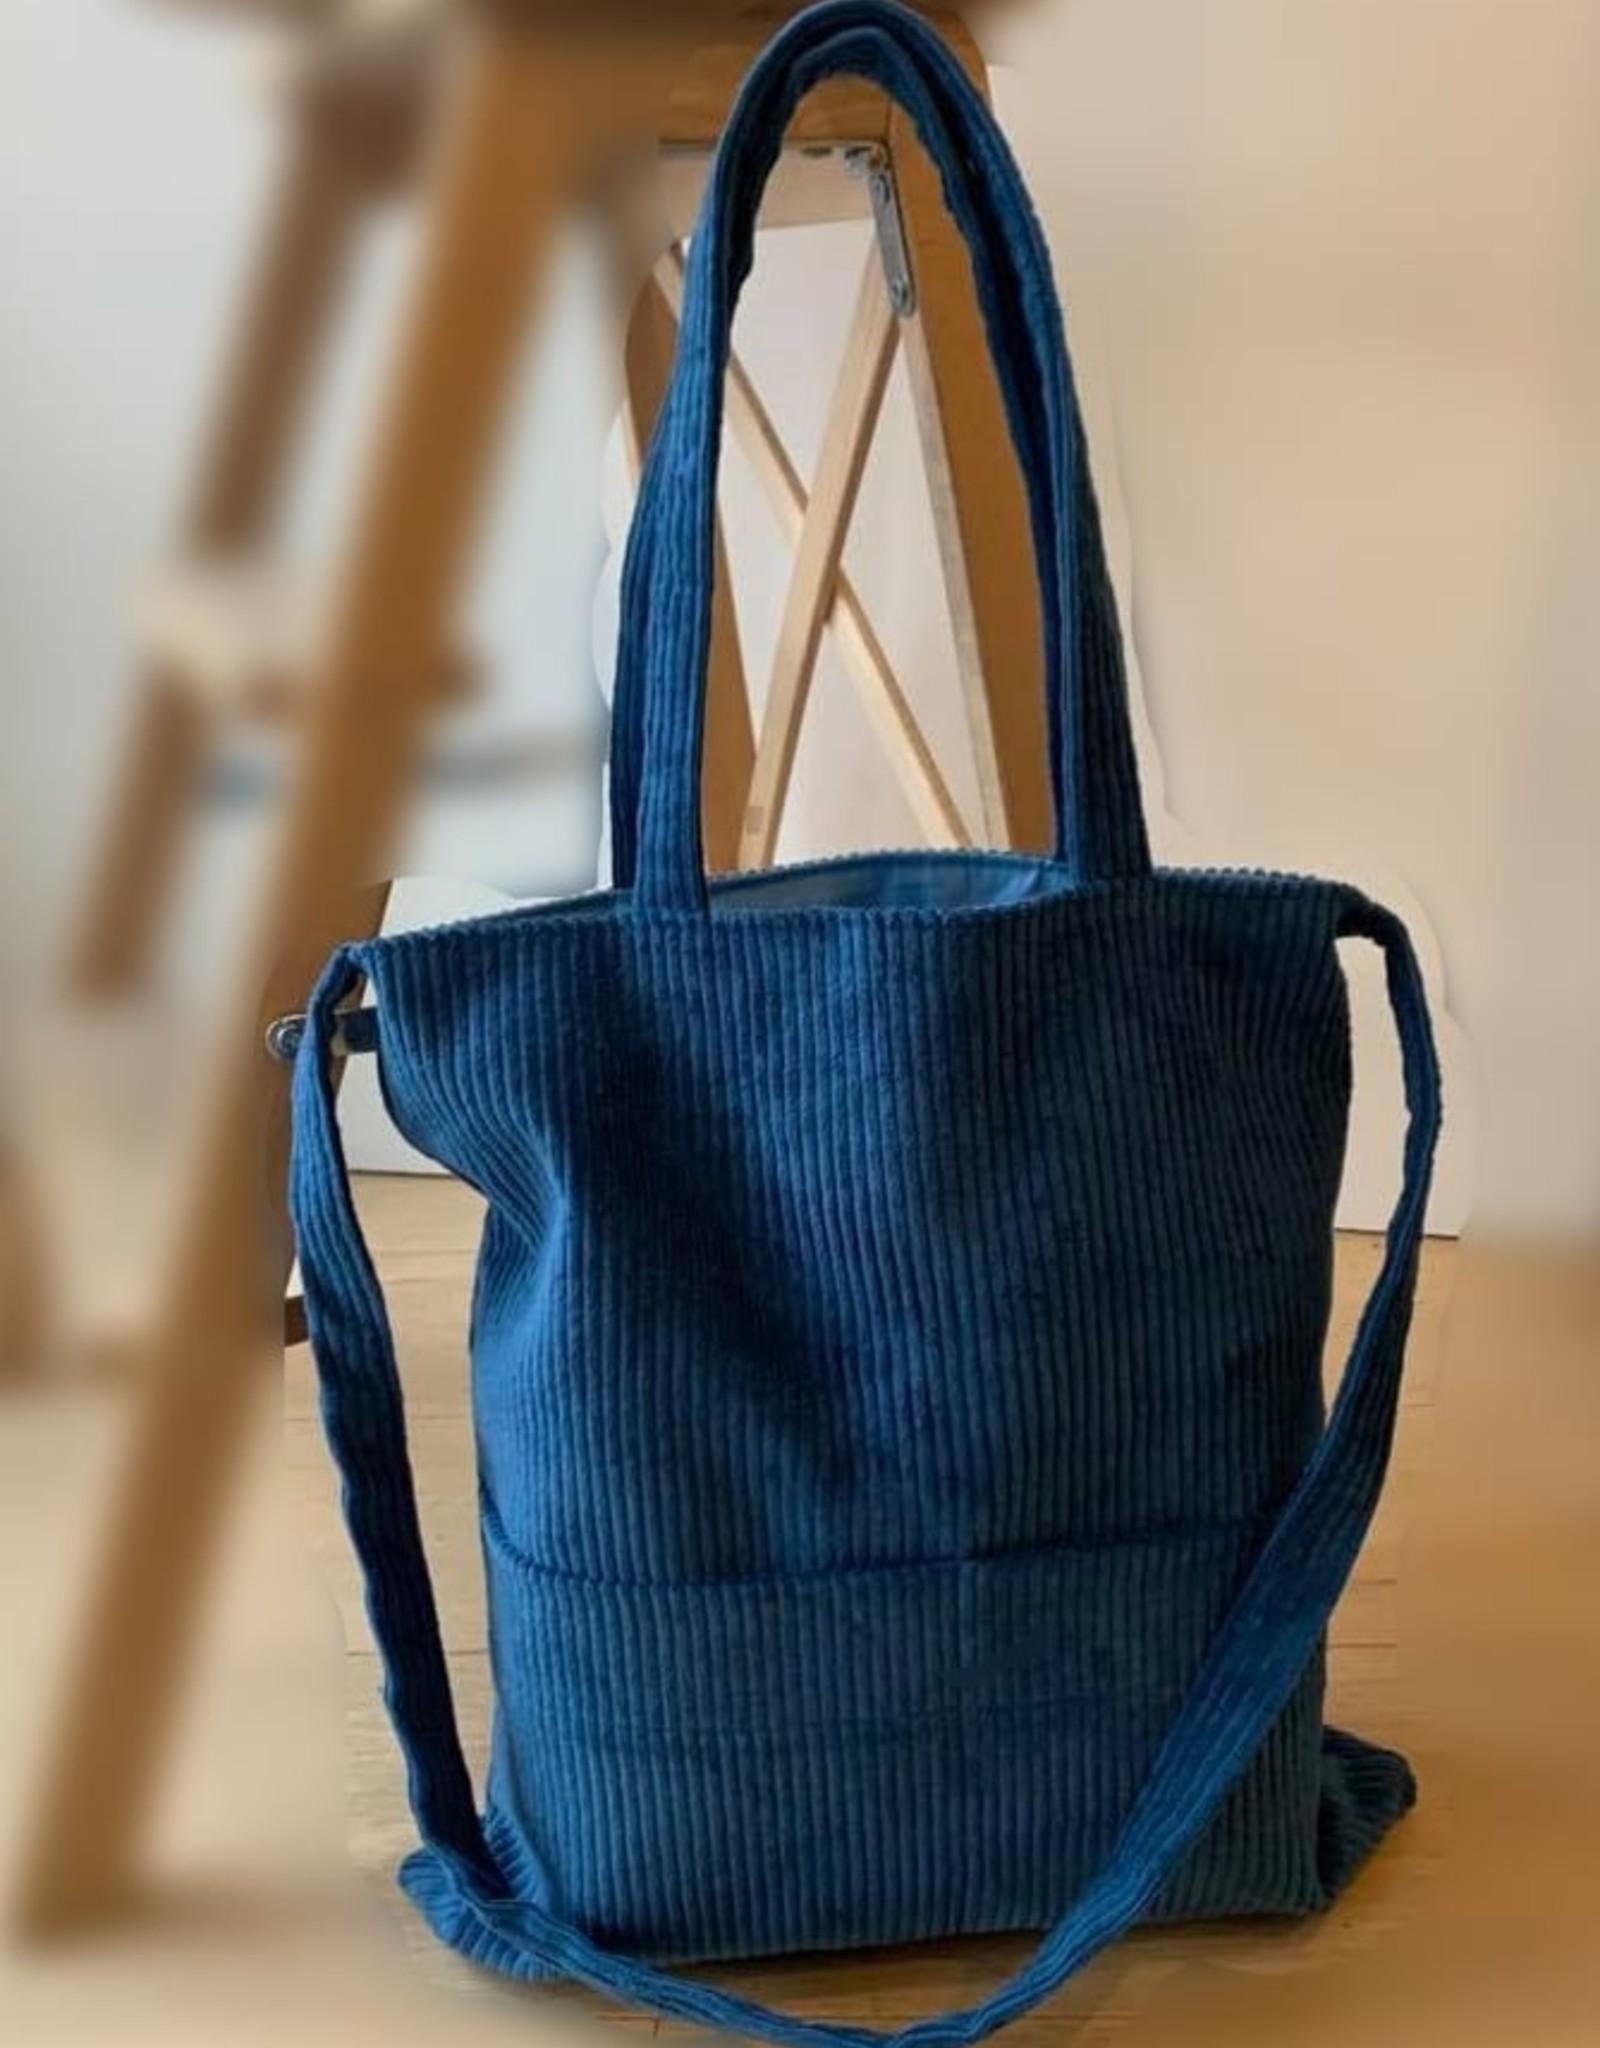 'In zak en tas' voor beginners  - 13 november 2021